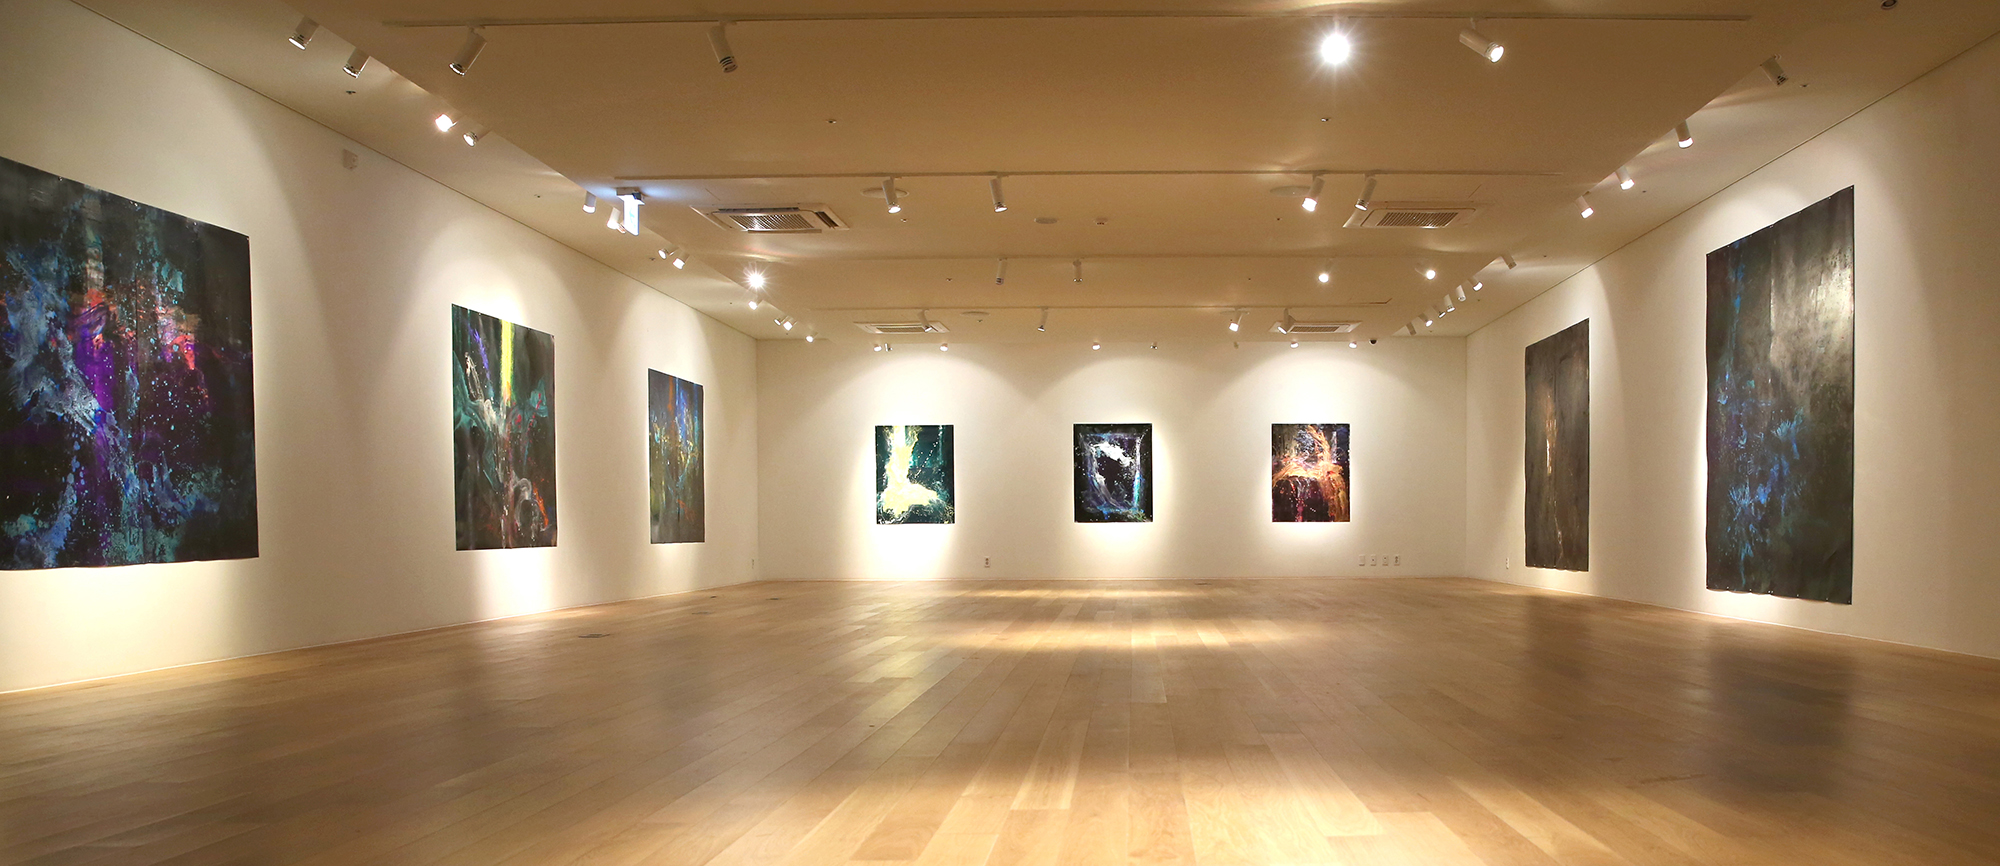 Color Proofs, Solo Exhibit, Ara Art Center, Seoul, Korea, 2014